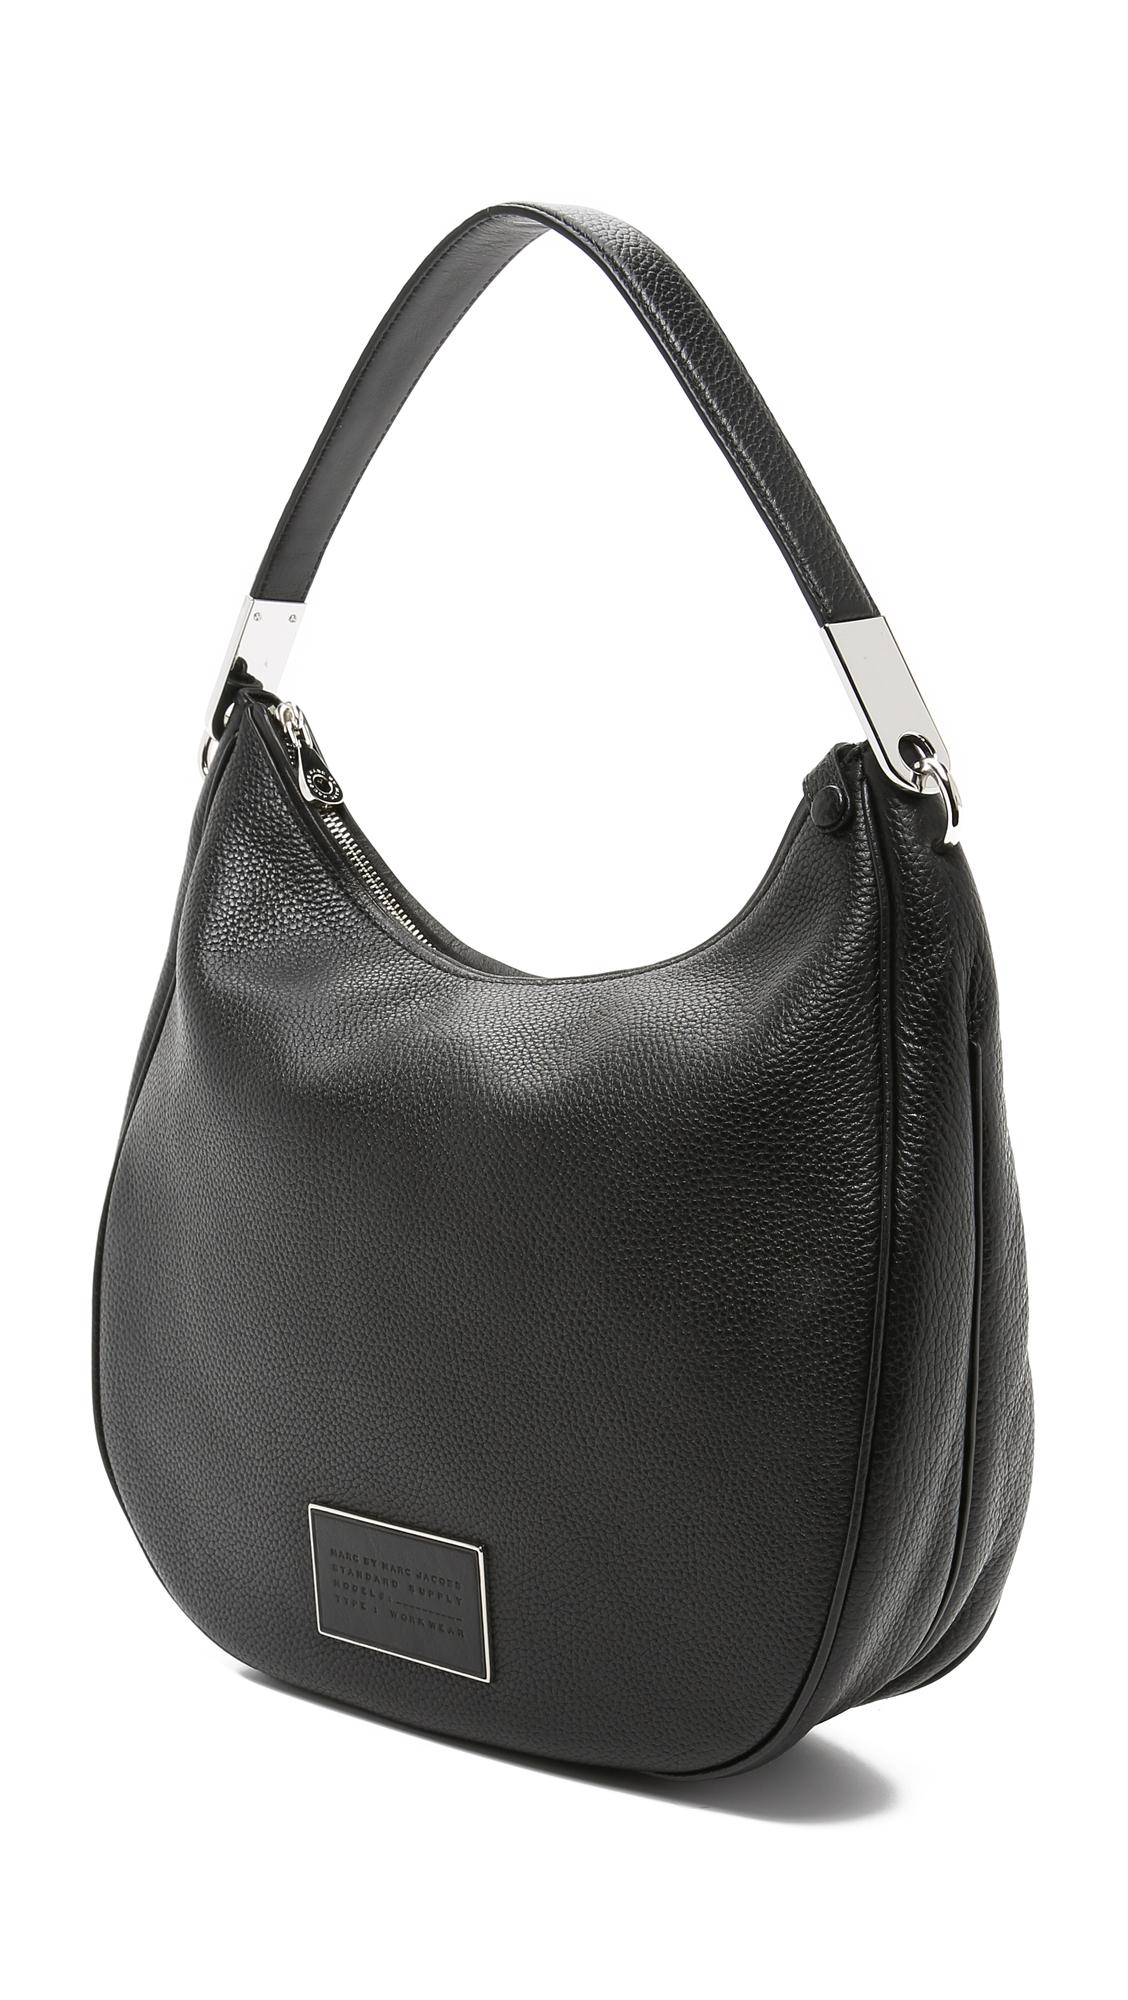 Marc by marc jacobs Ligero Hobo Bag - Black in Black | Lyst